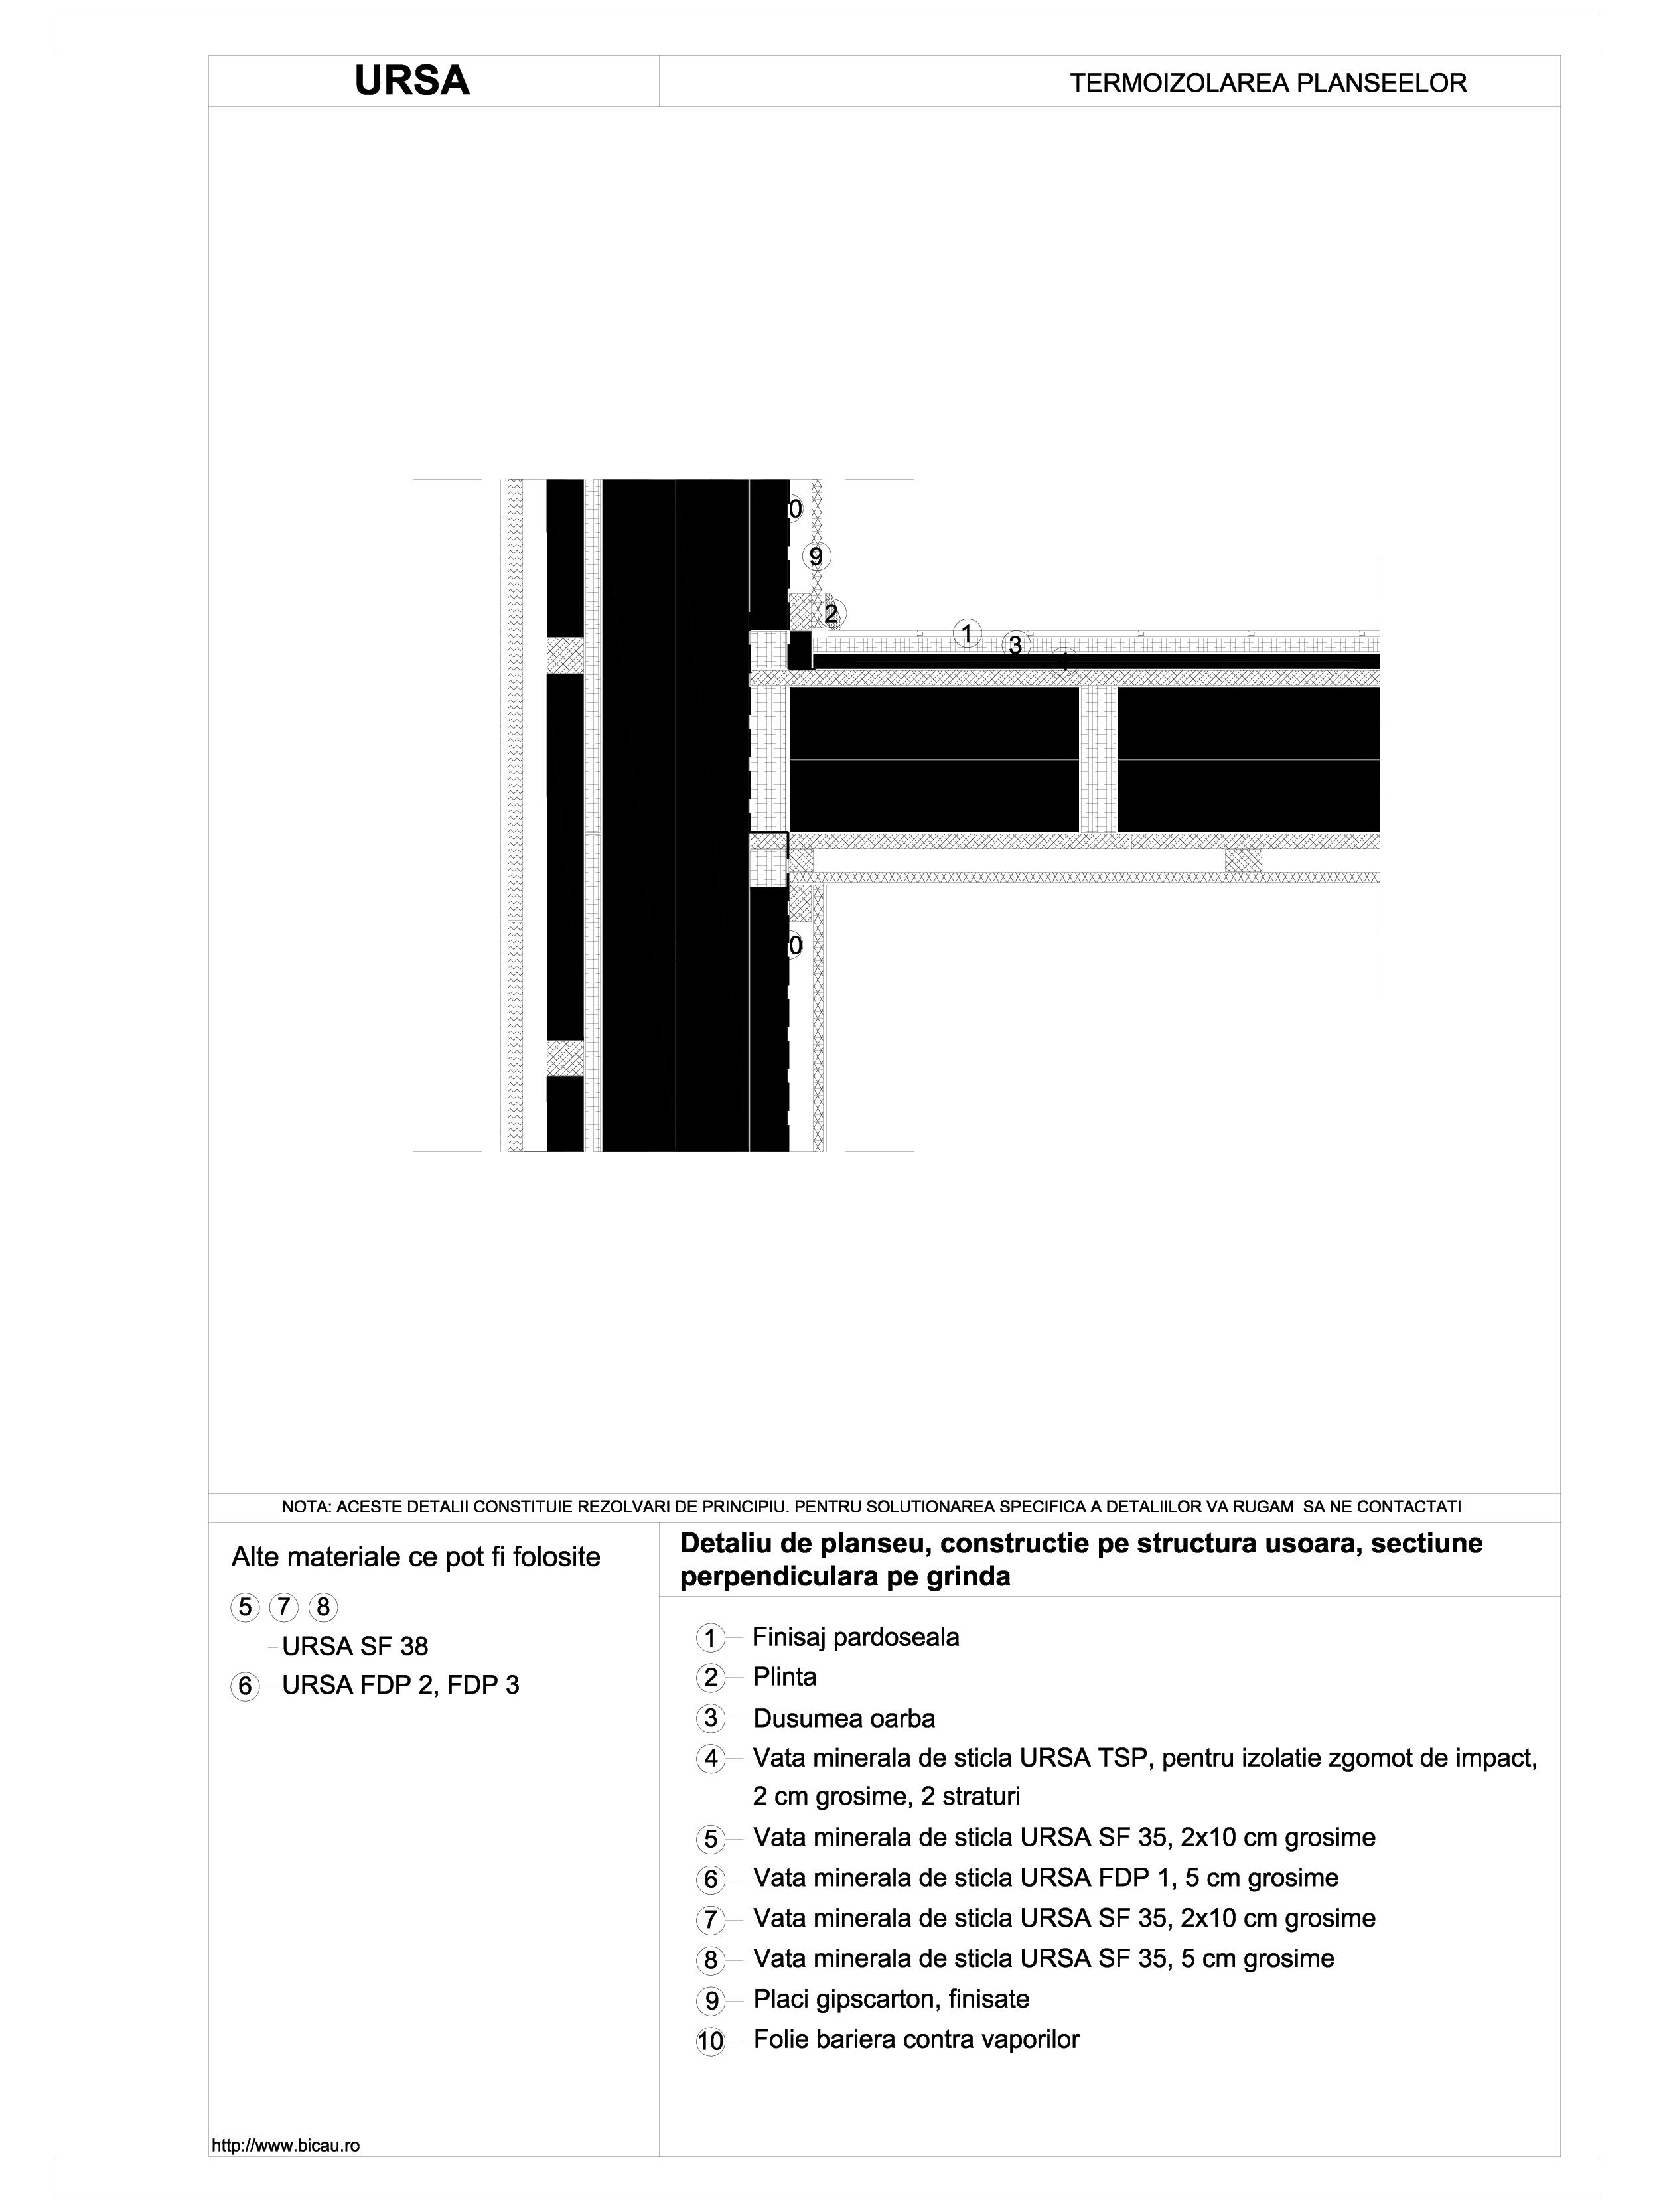 Detaliu de planseu, constructie pe structura usoara, sectiune perpendiculara pe grinda TSP URSA Vata minerala pentru pardoseli URSA ROMANIA   - Pagina 1